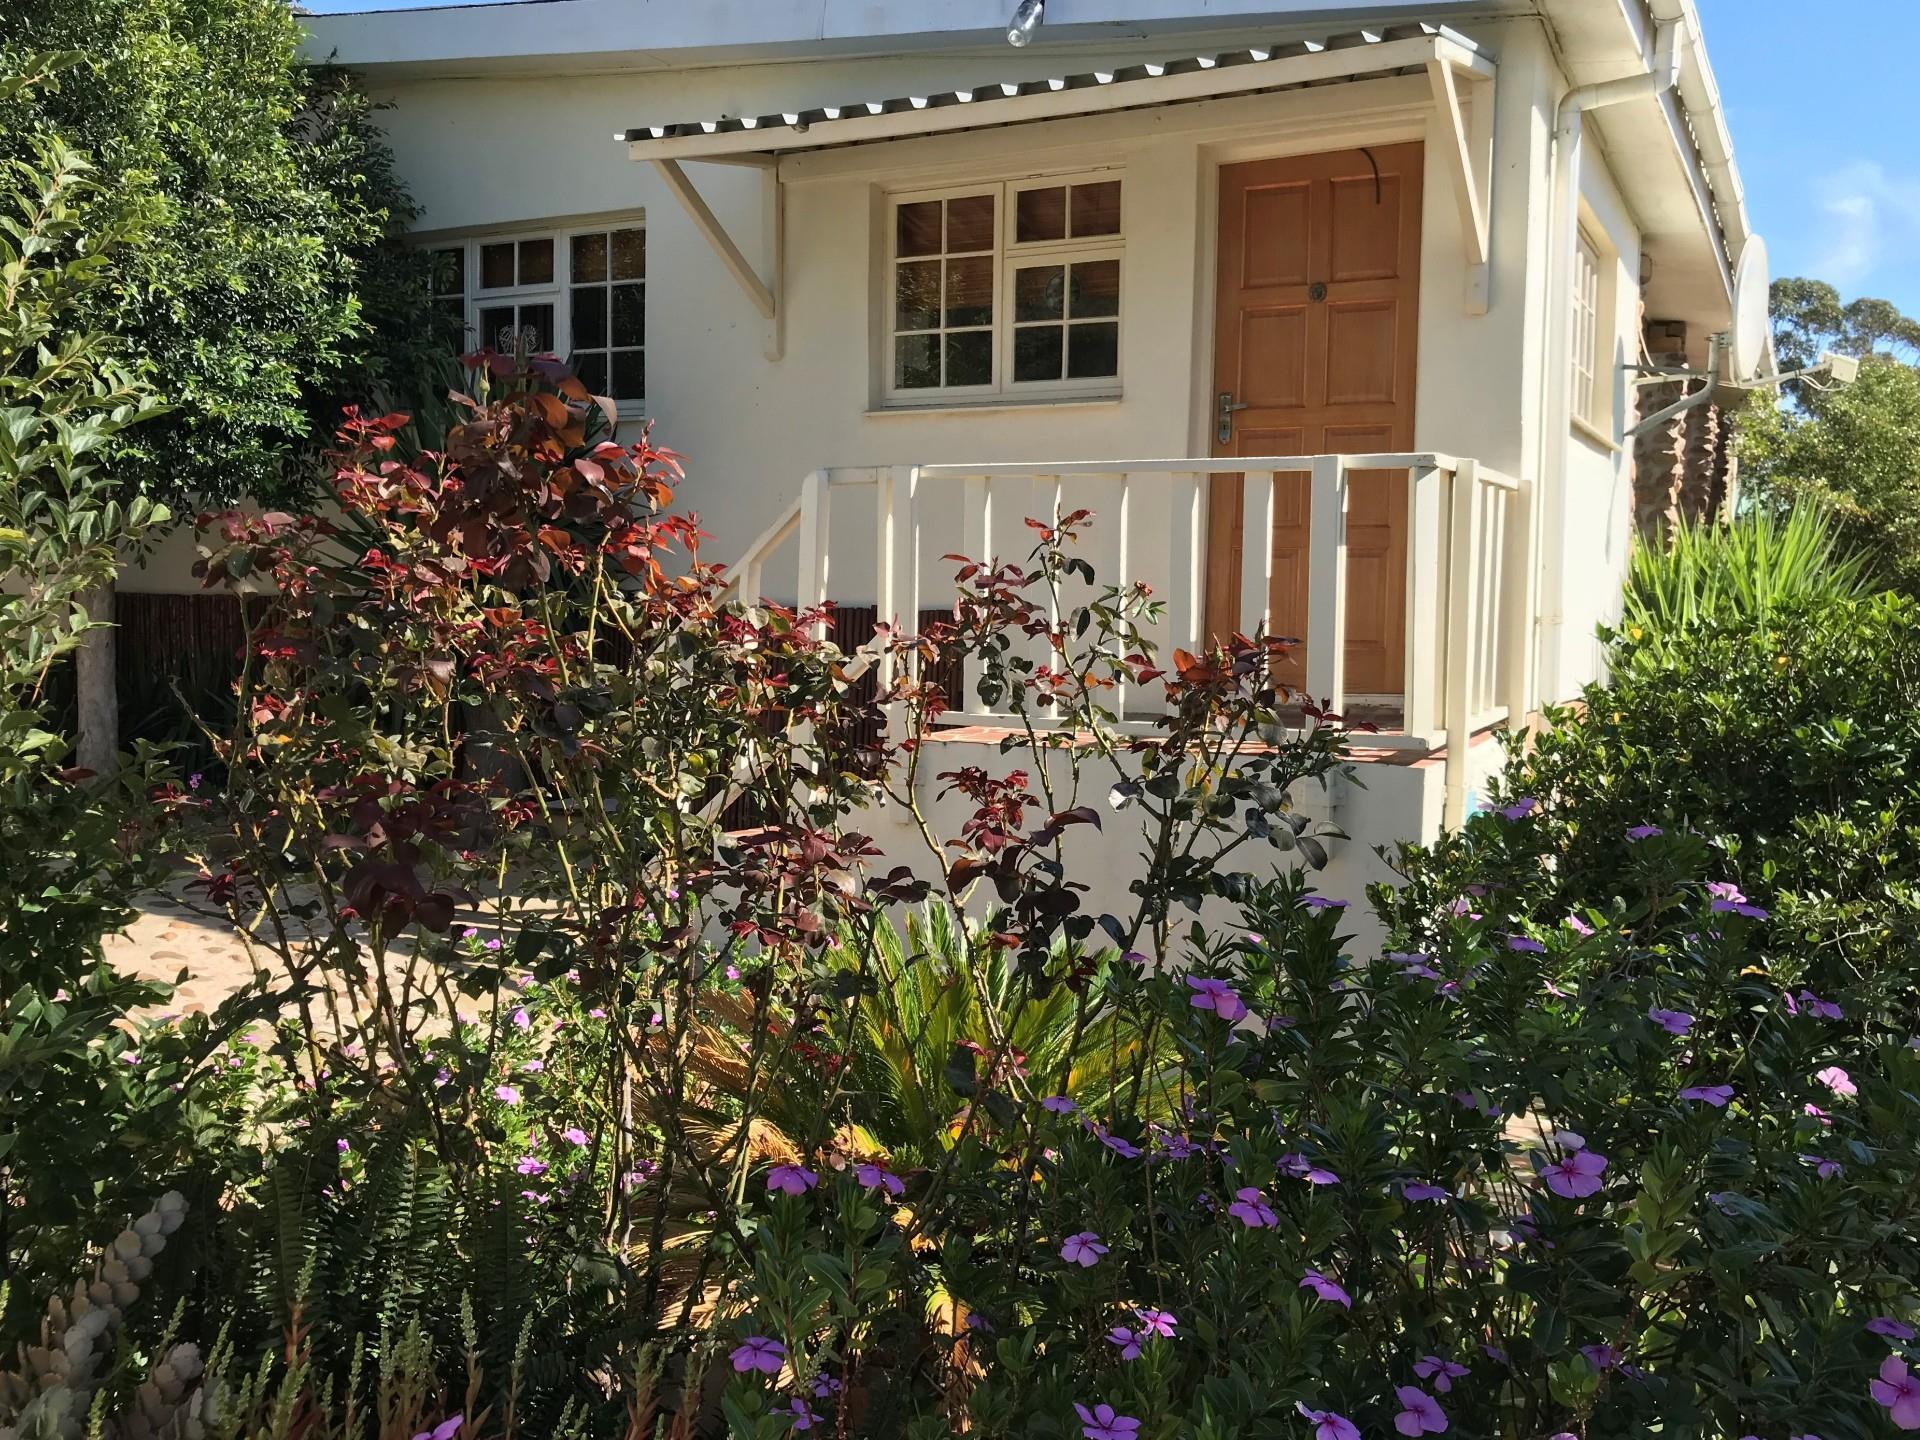 3 Bedroom House For Sale in Riebeek West